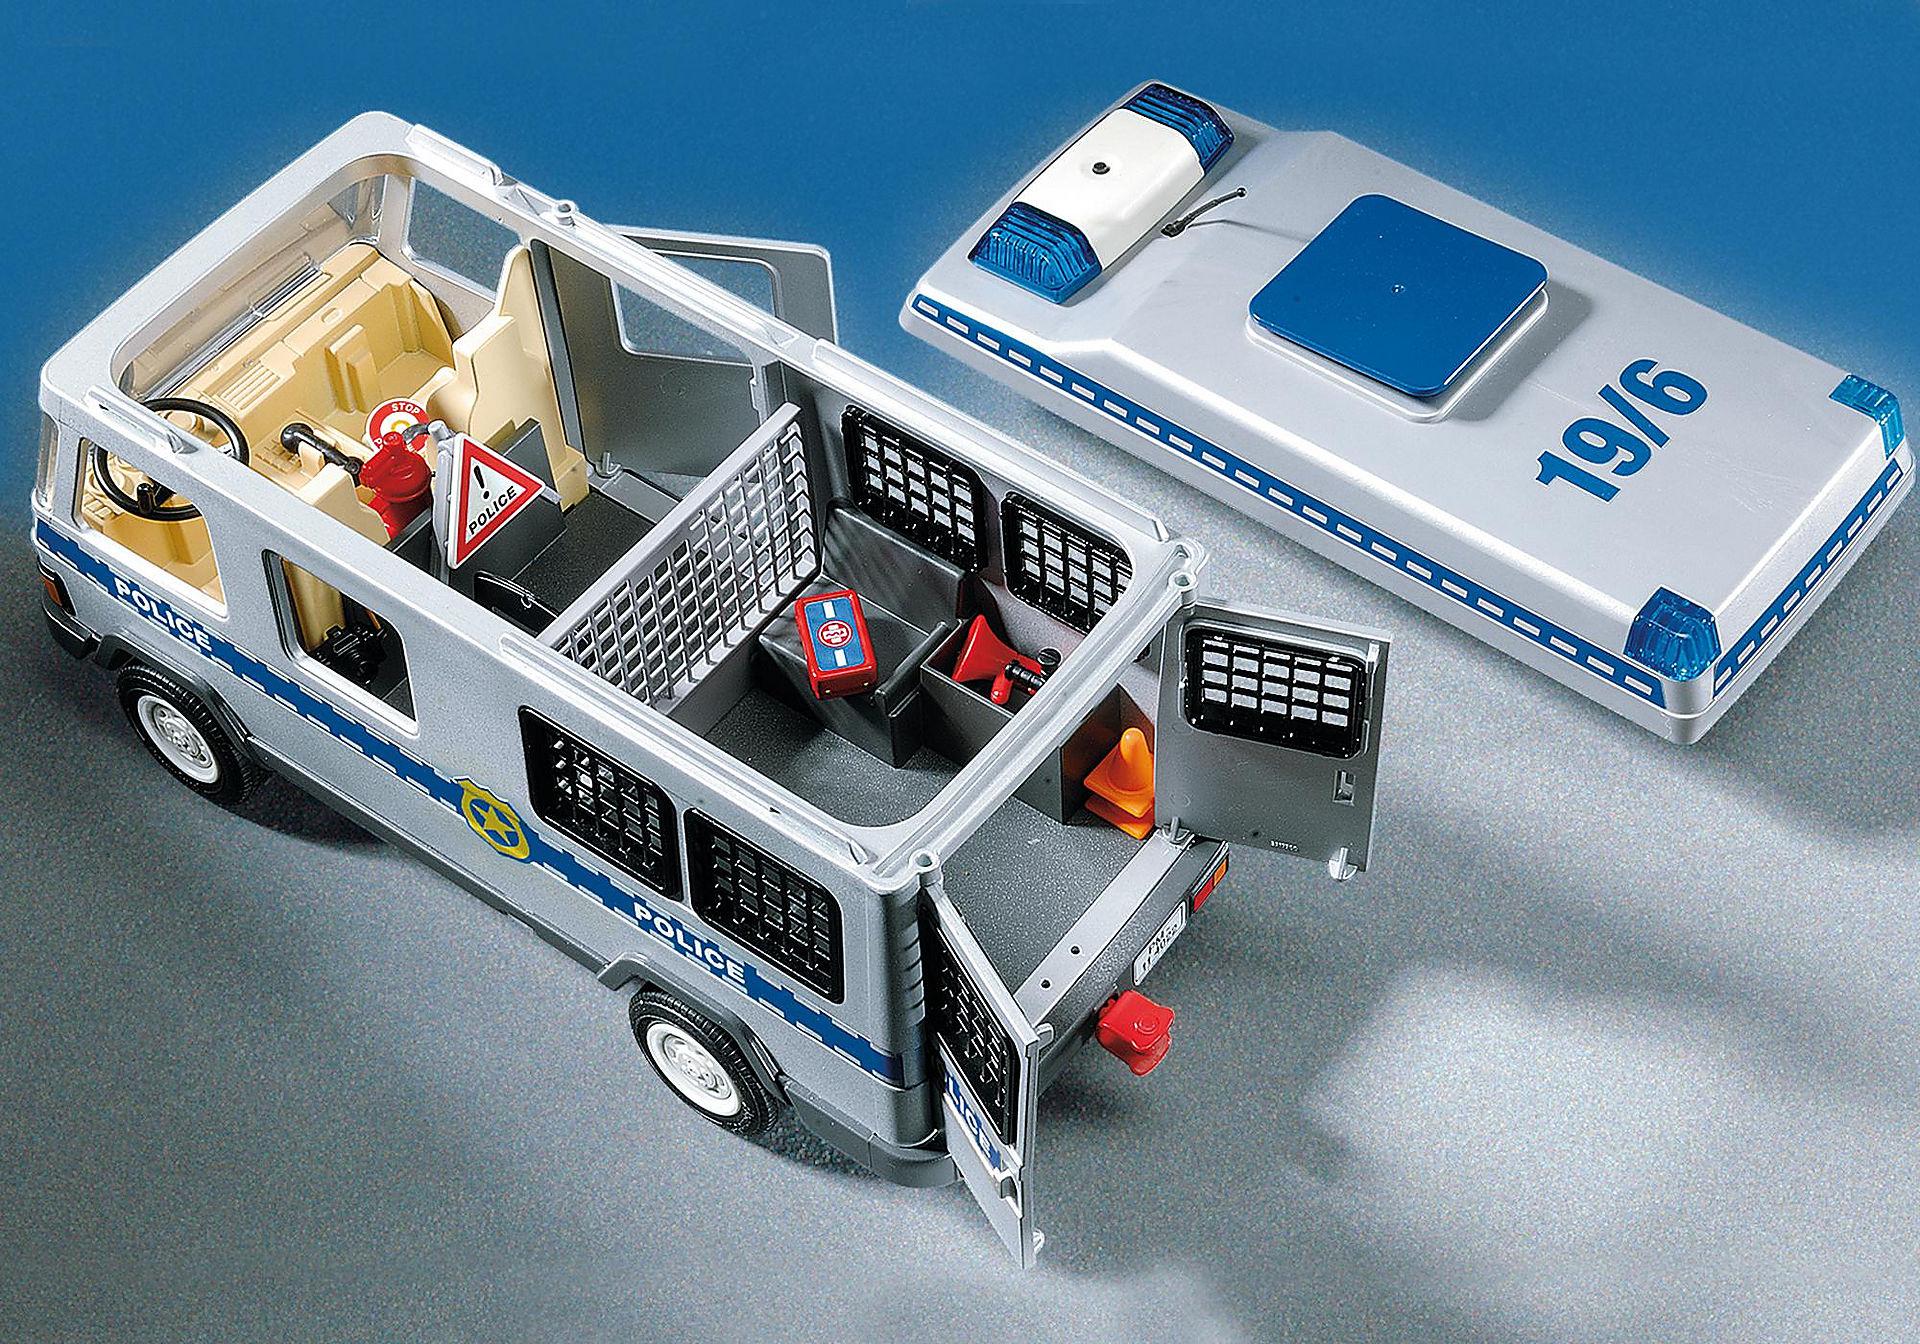 http://media.playmobil.com/i/playmobil/4023_product_extra1/Mobiele politie eenheid